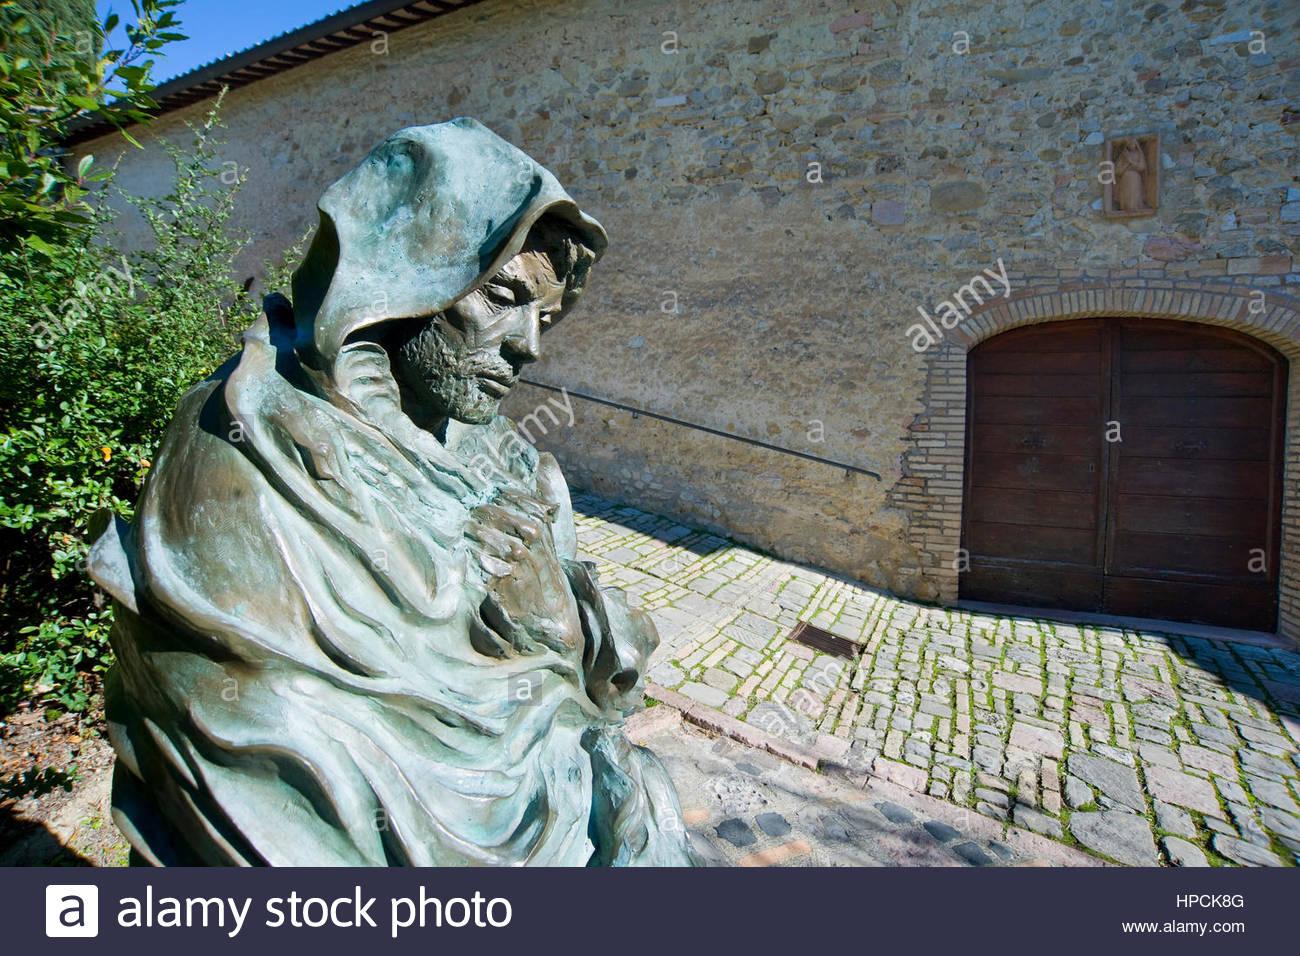 Shrine of St. Damian,Assisi,Umbria,Italy - Stock Image